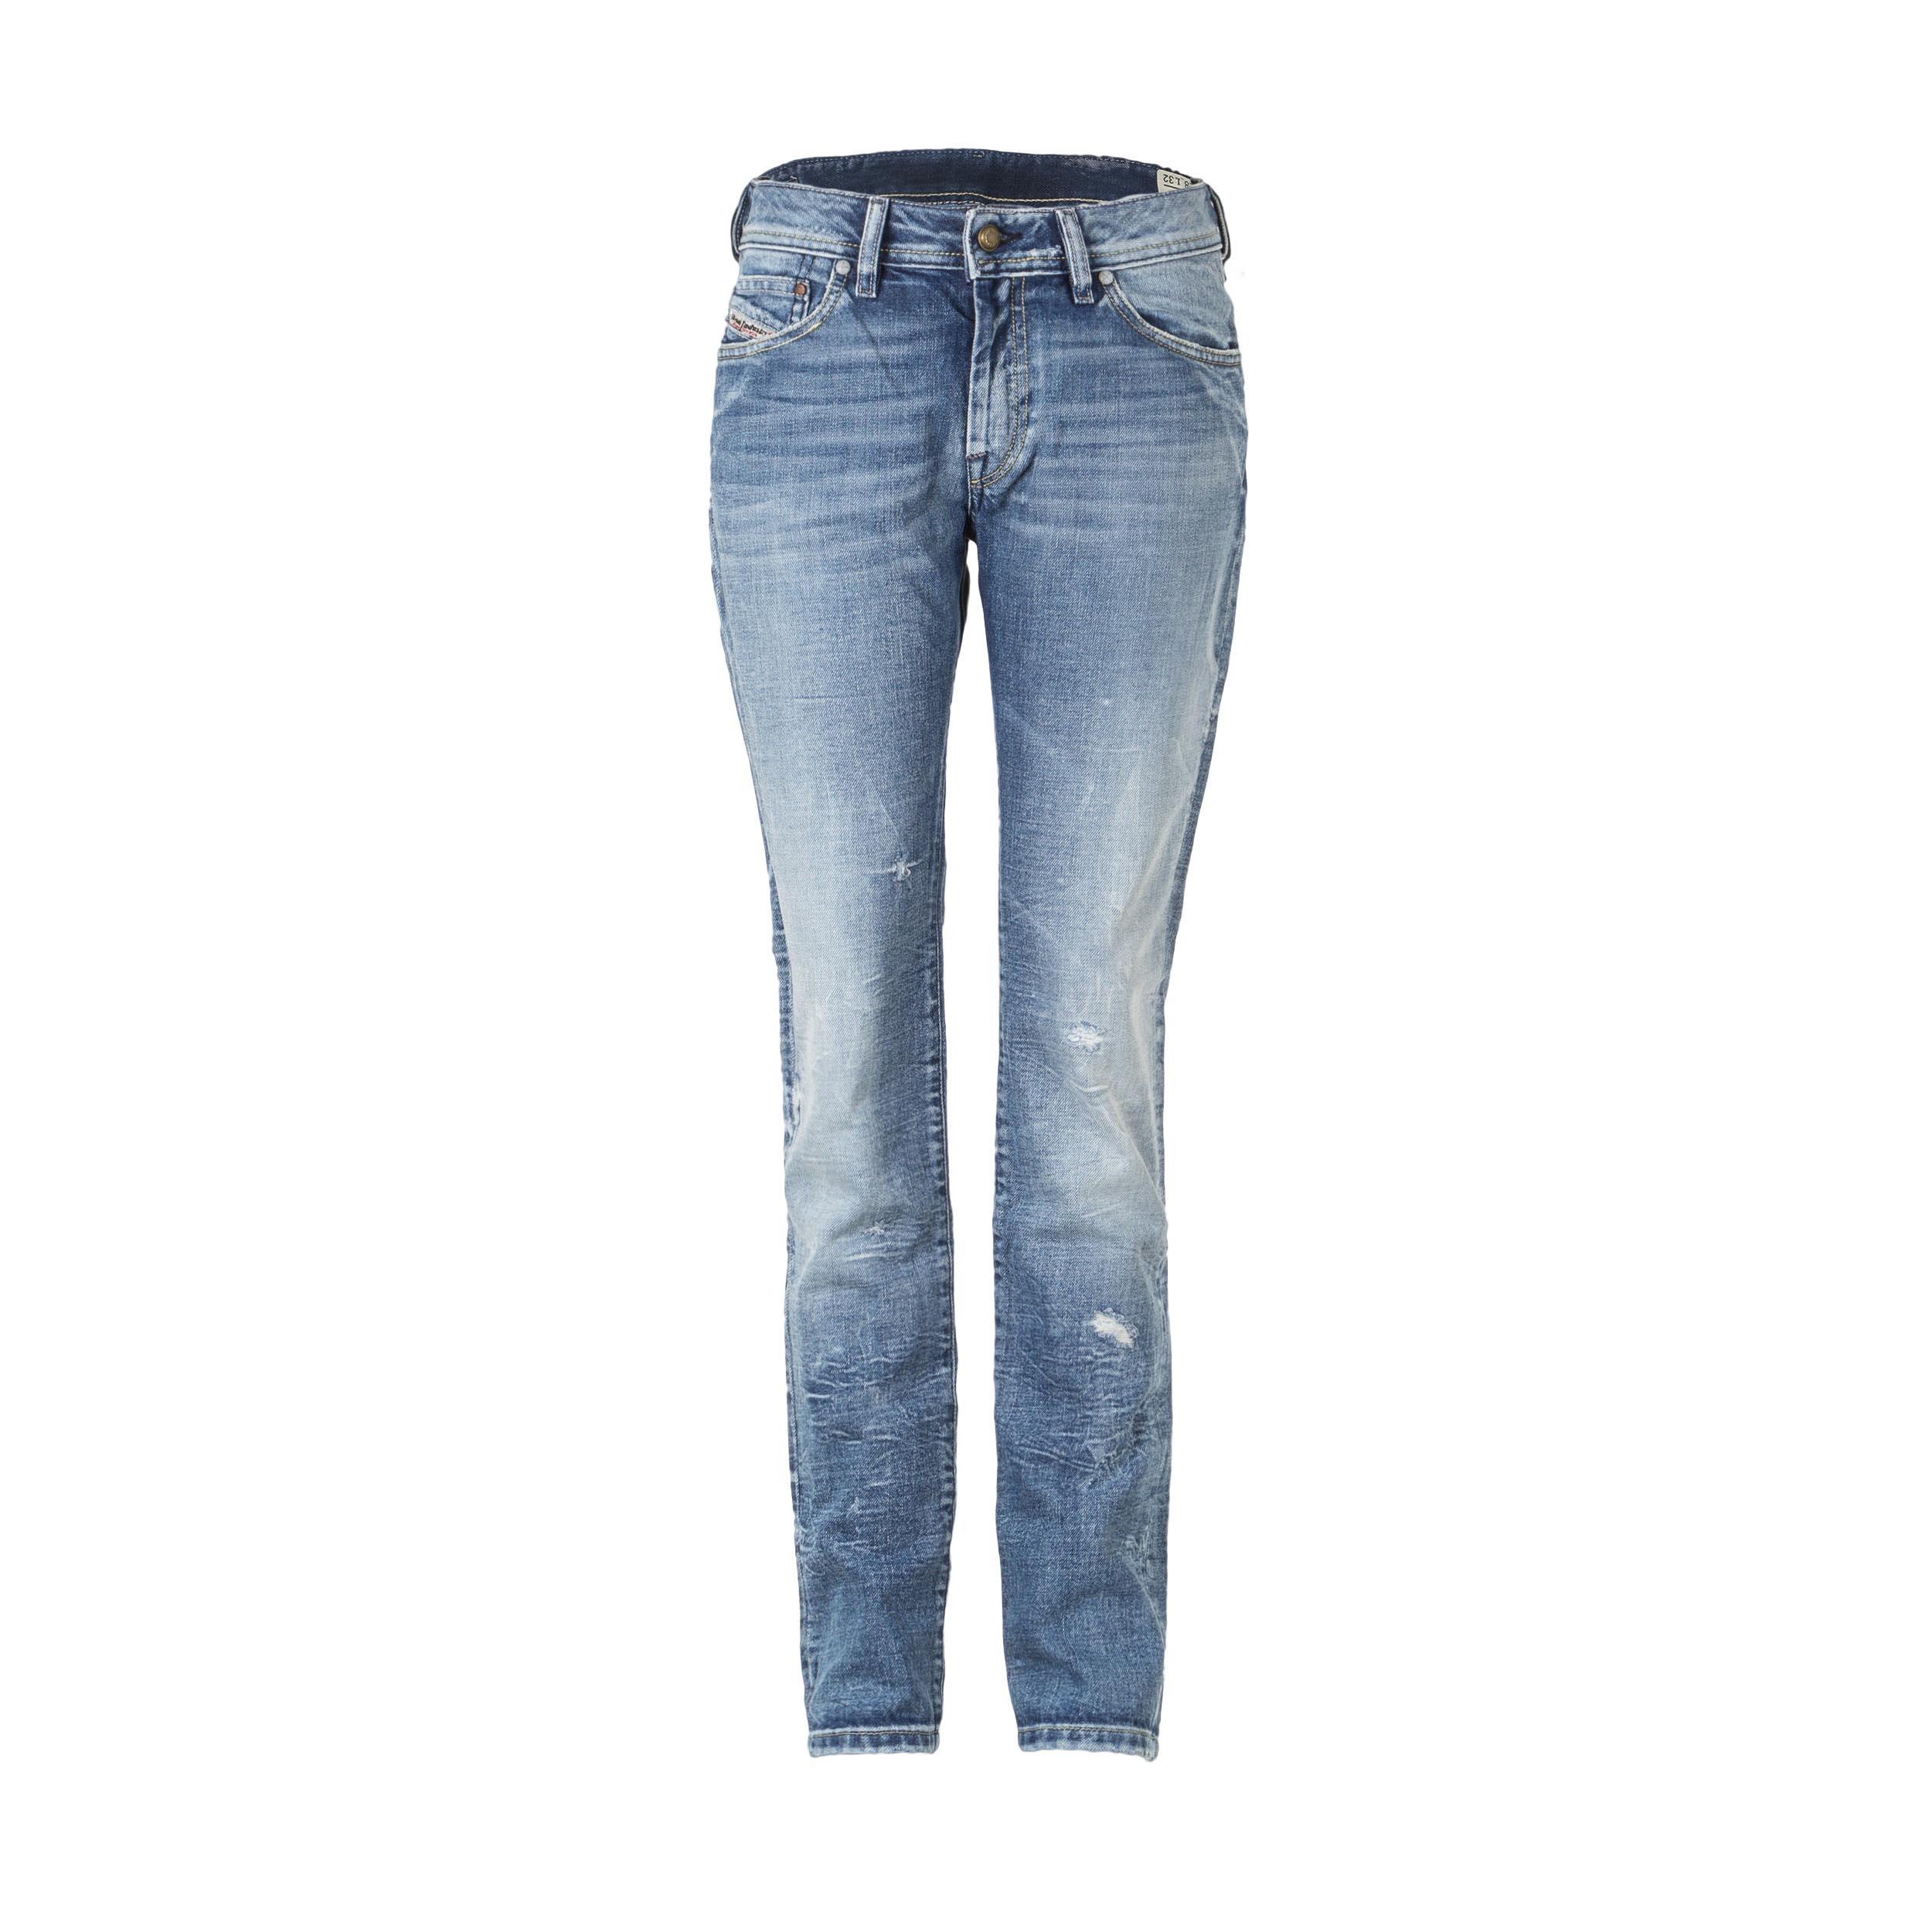 Hosen - Diesel Damen Jeans FLOY blau Länge 32  - Onlineshop Luxury Loft